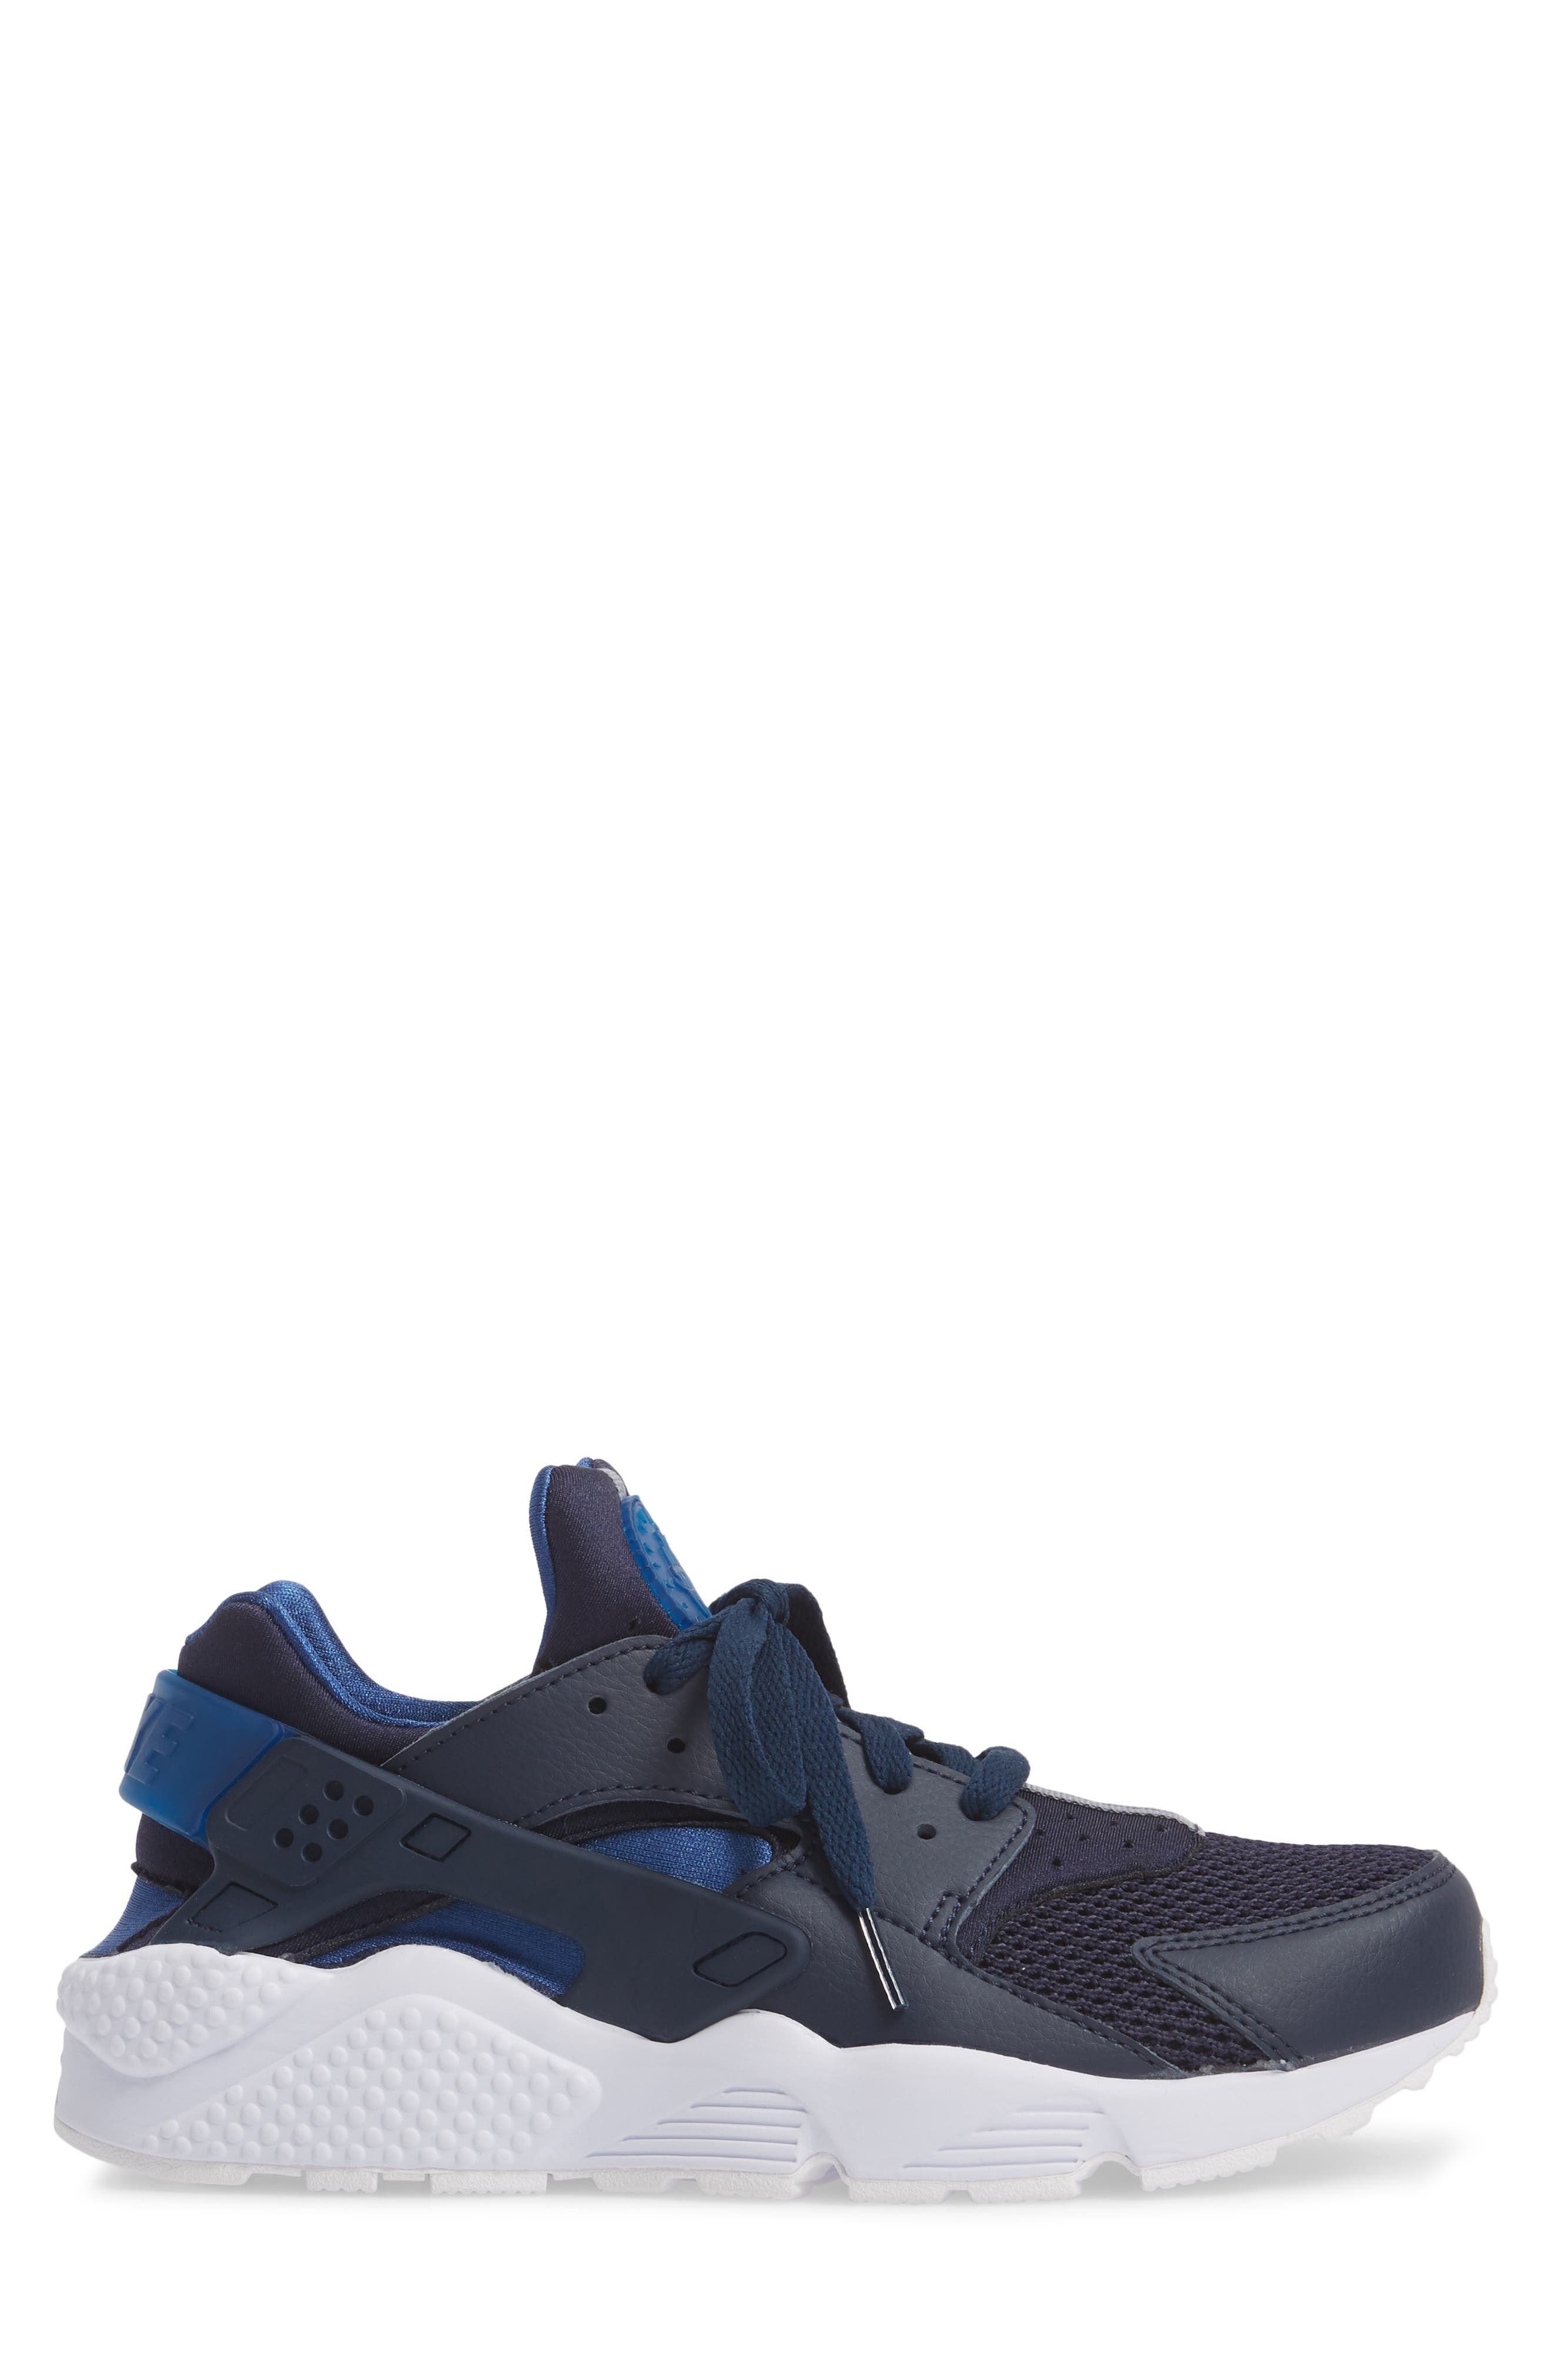 'Air Huarache' Sneaker,                             Alternate thumbnail 5, color,                             Obsidian/ Gym Blue